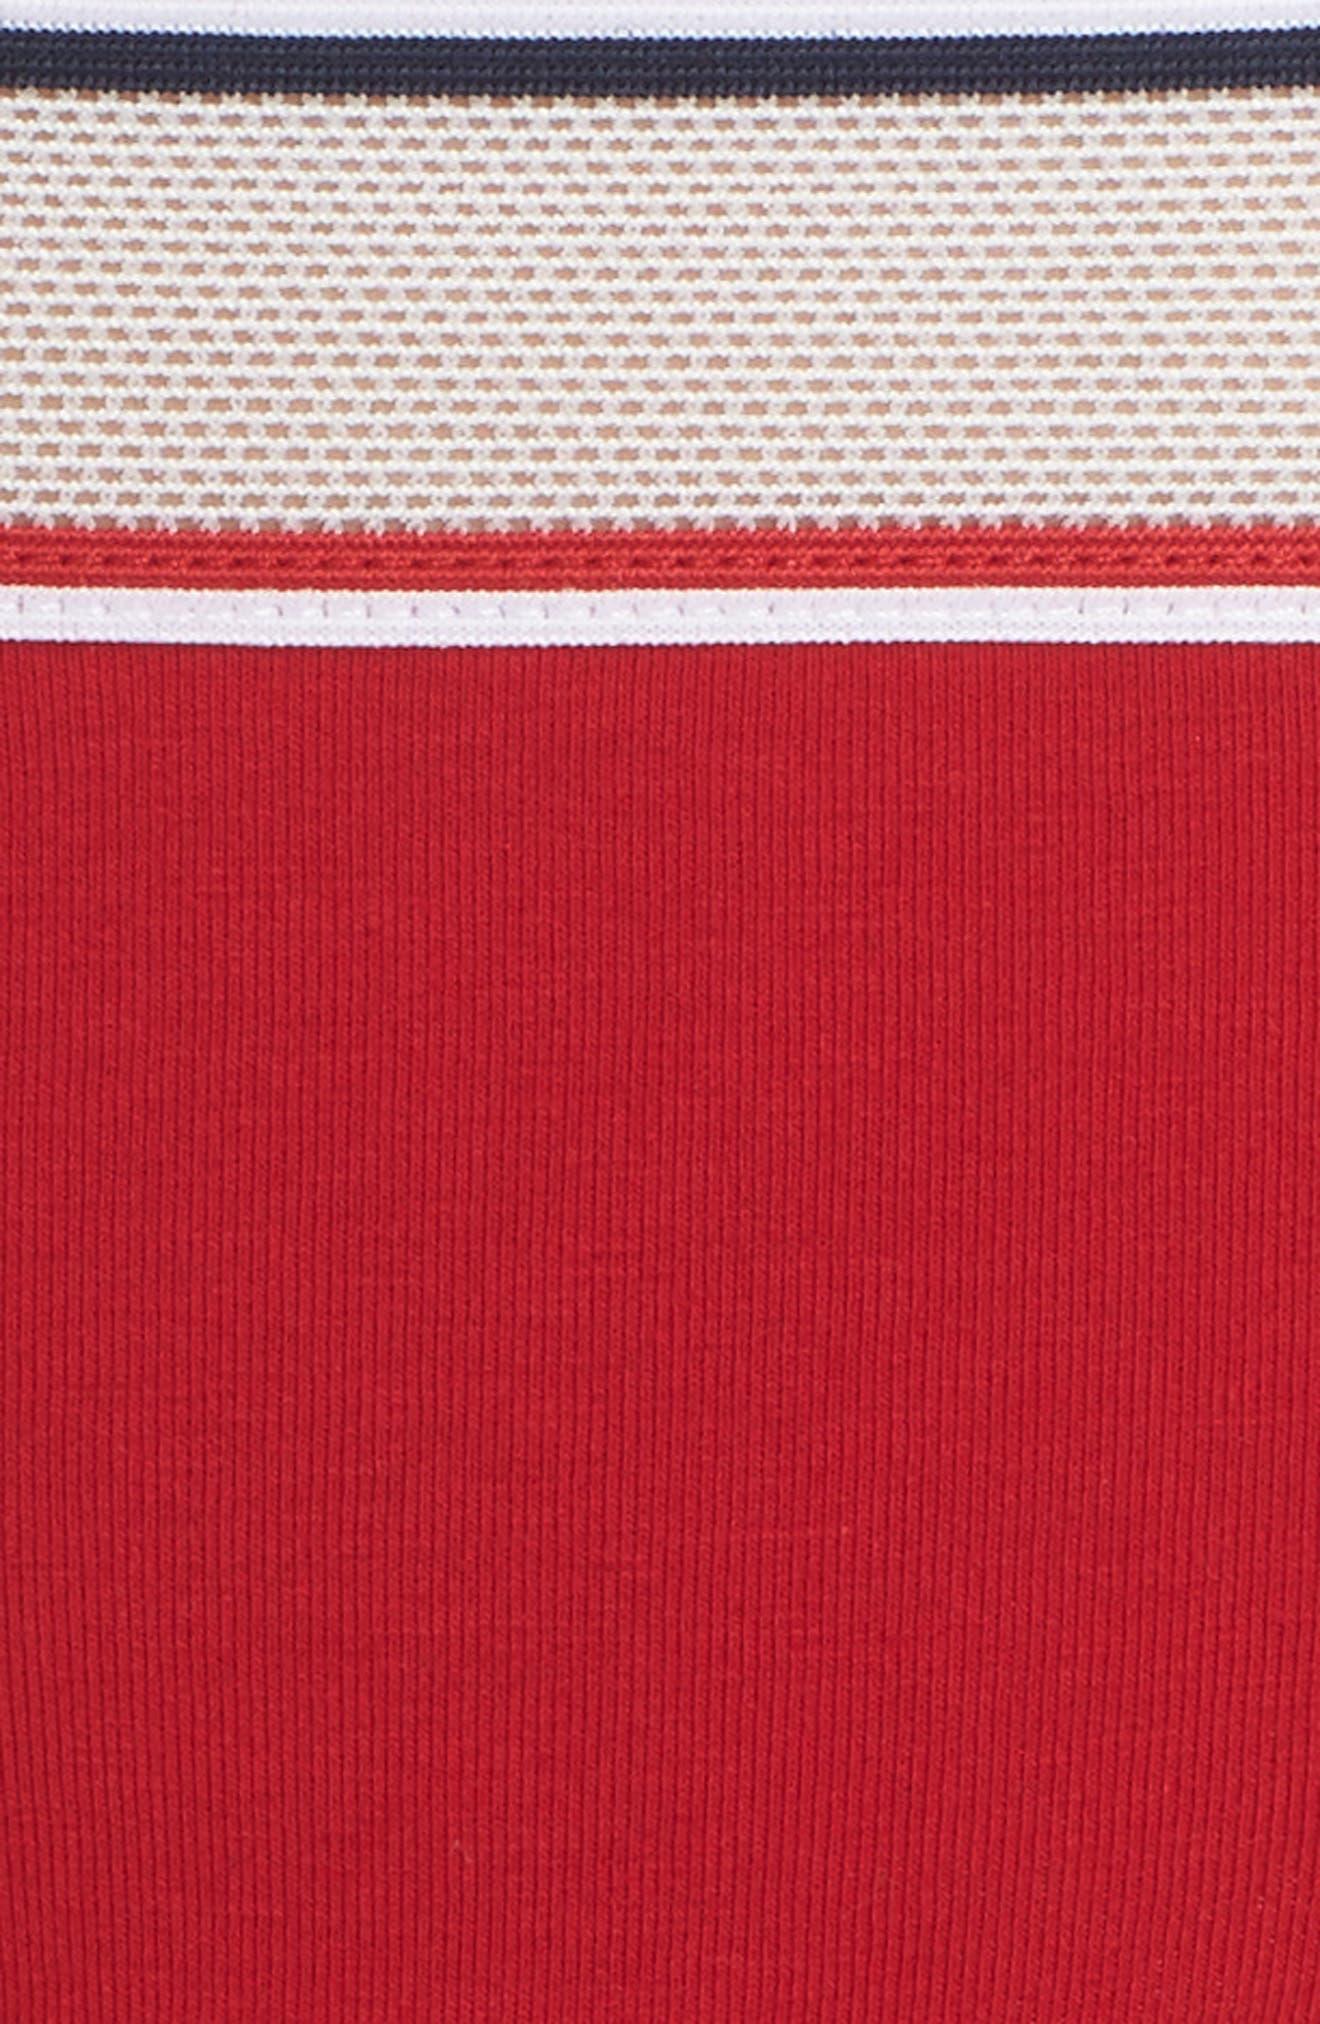 Mesh Band Thong,                             Alternate thumbnail 6, color,                             Apple Red